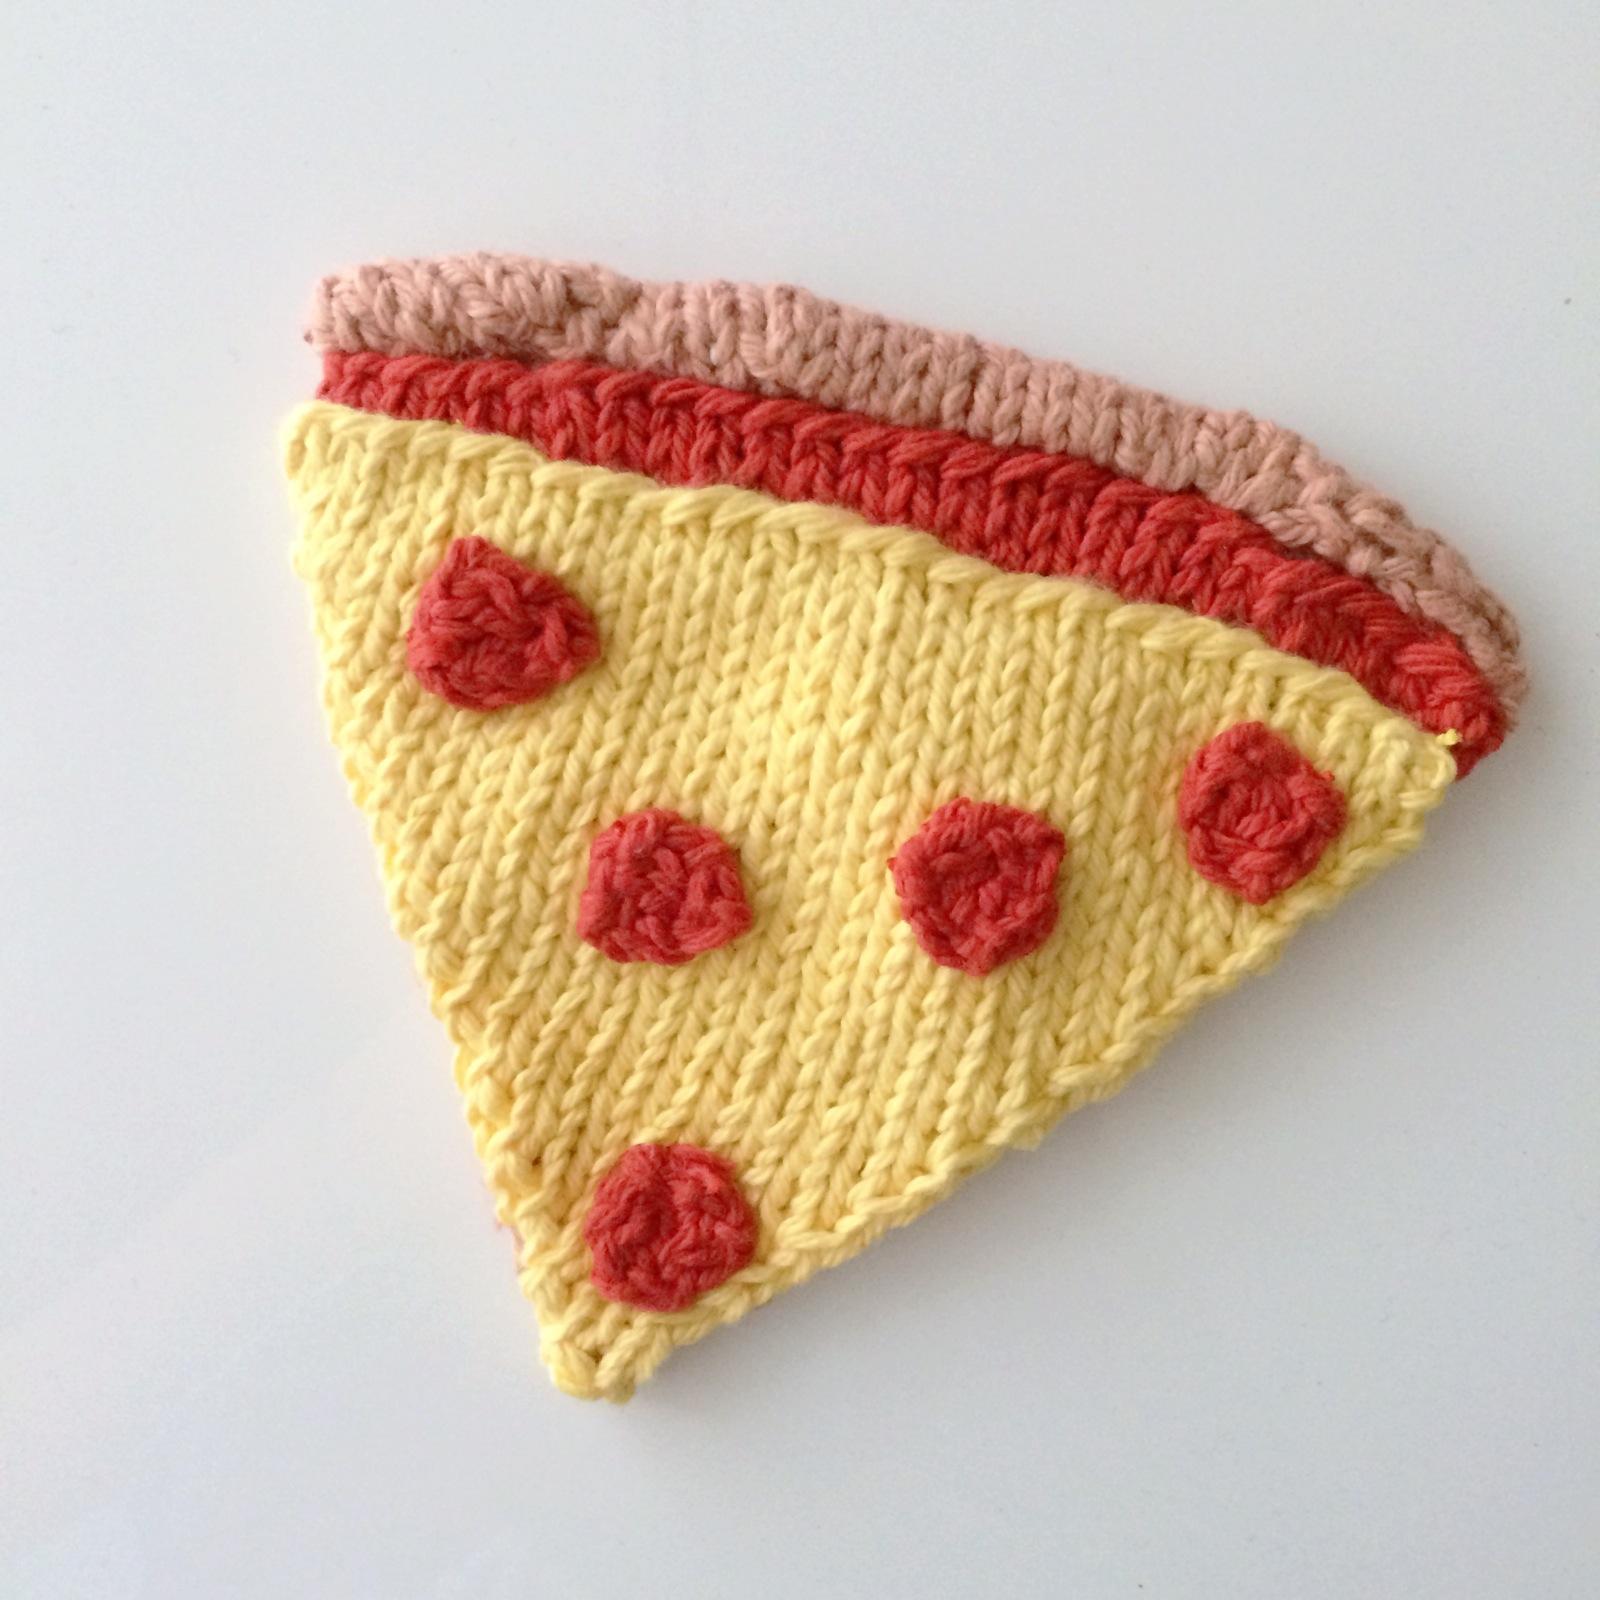 Knit Pizza